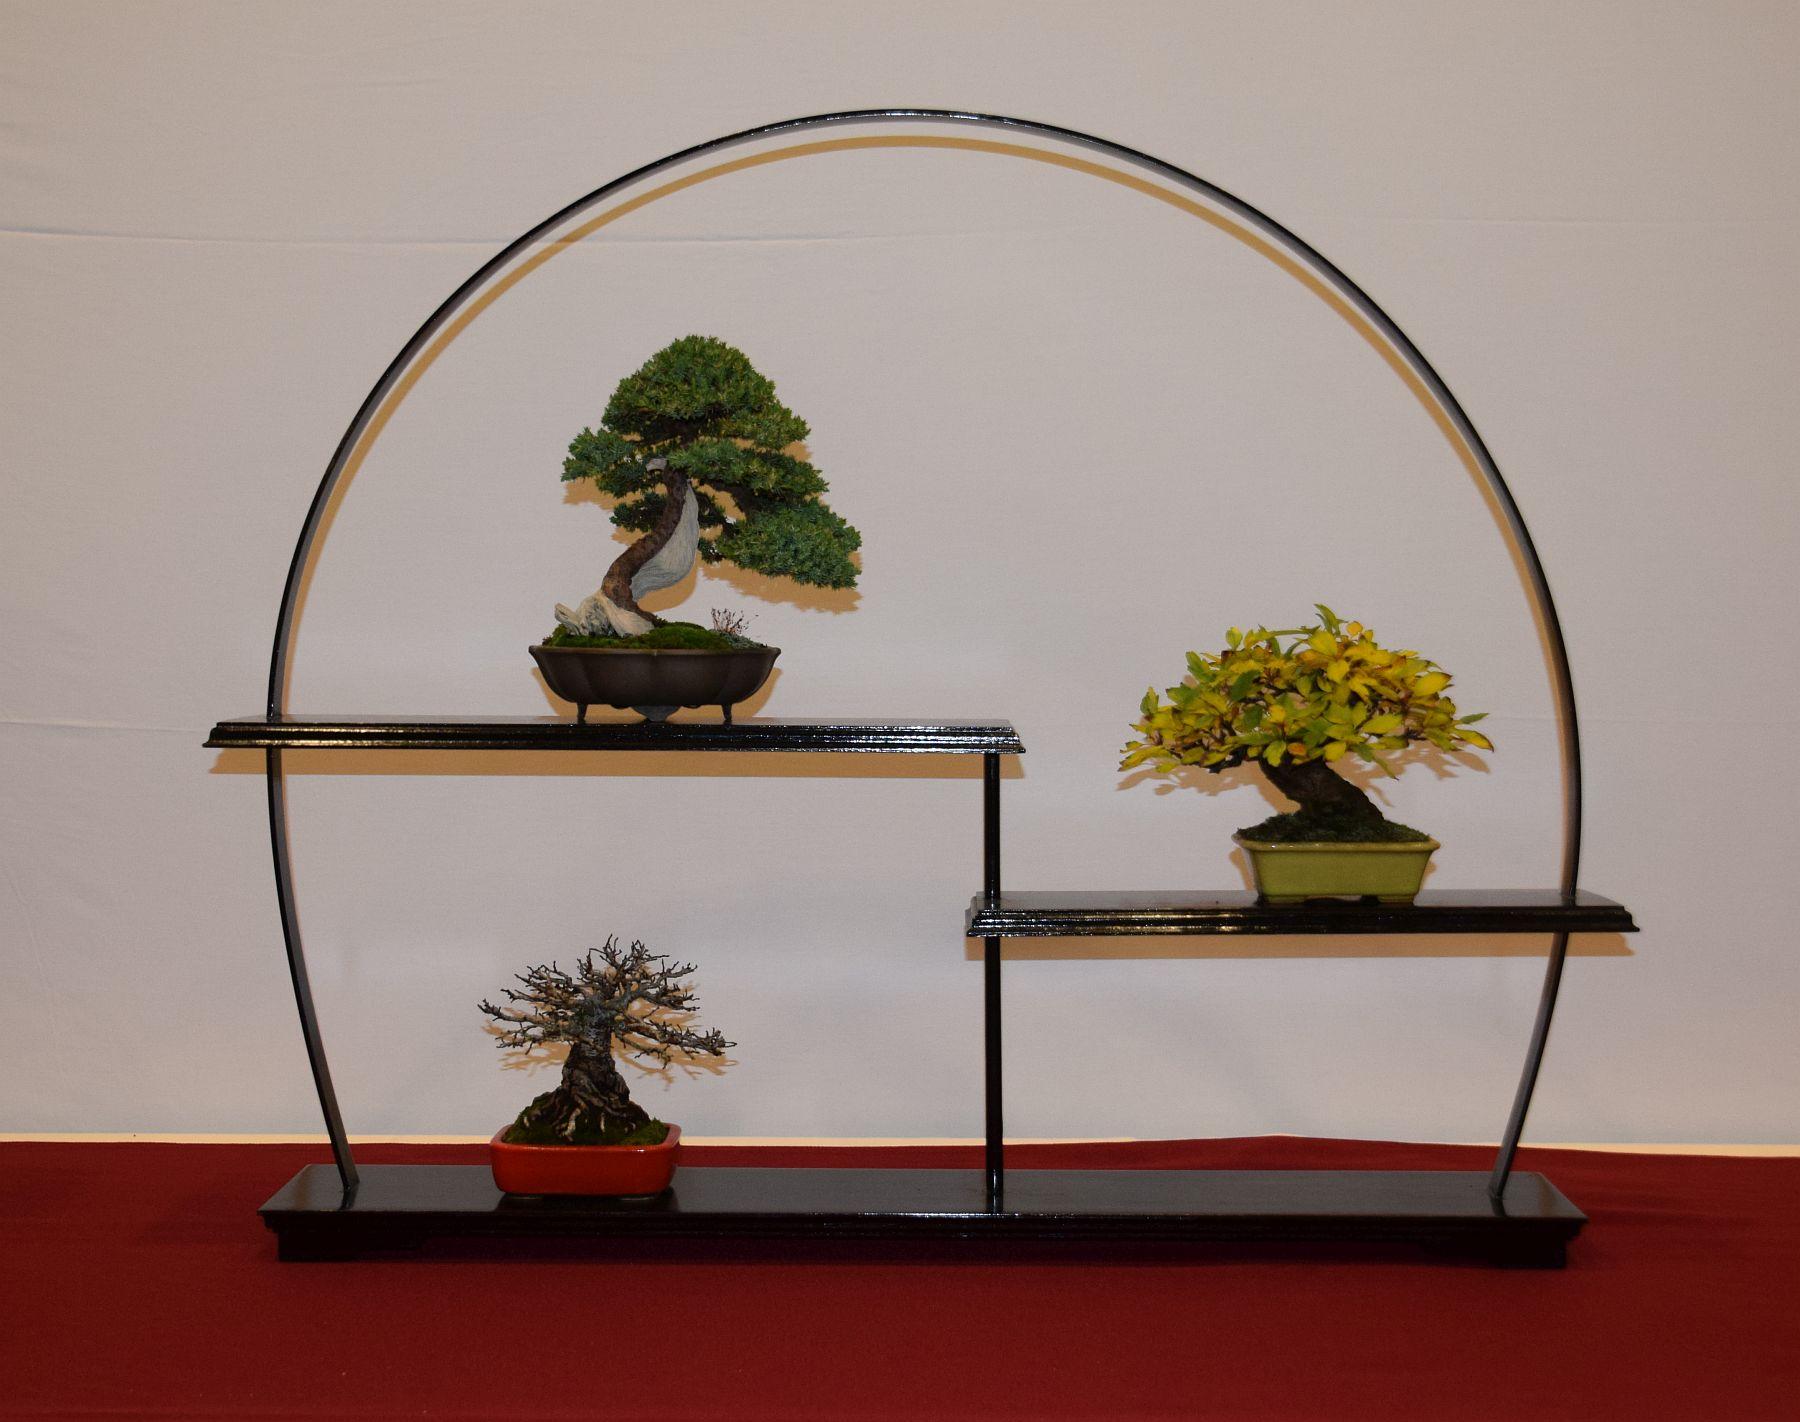 euk-bonsai-ten-2016-club-bonsai-080